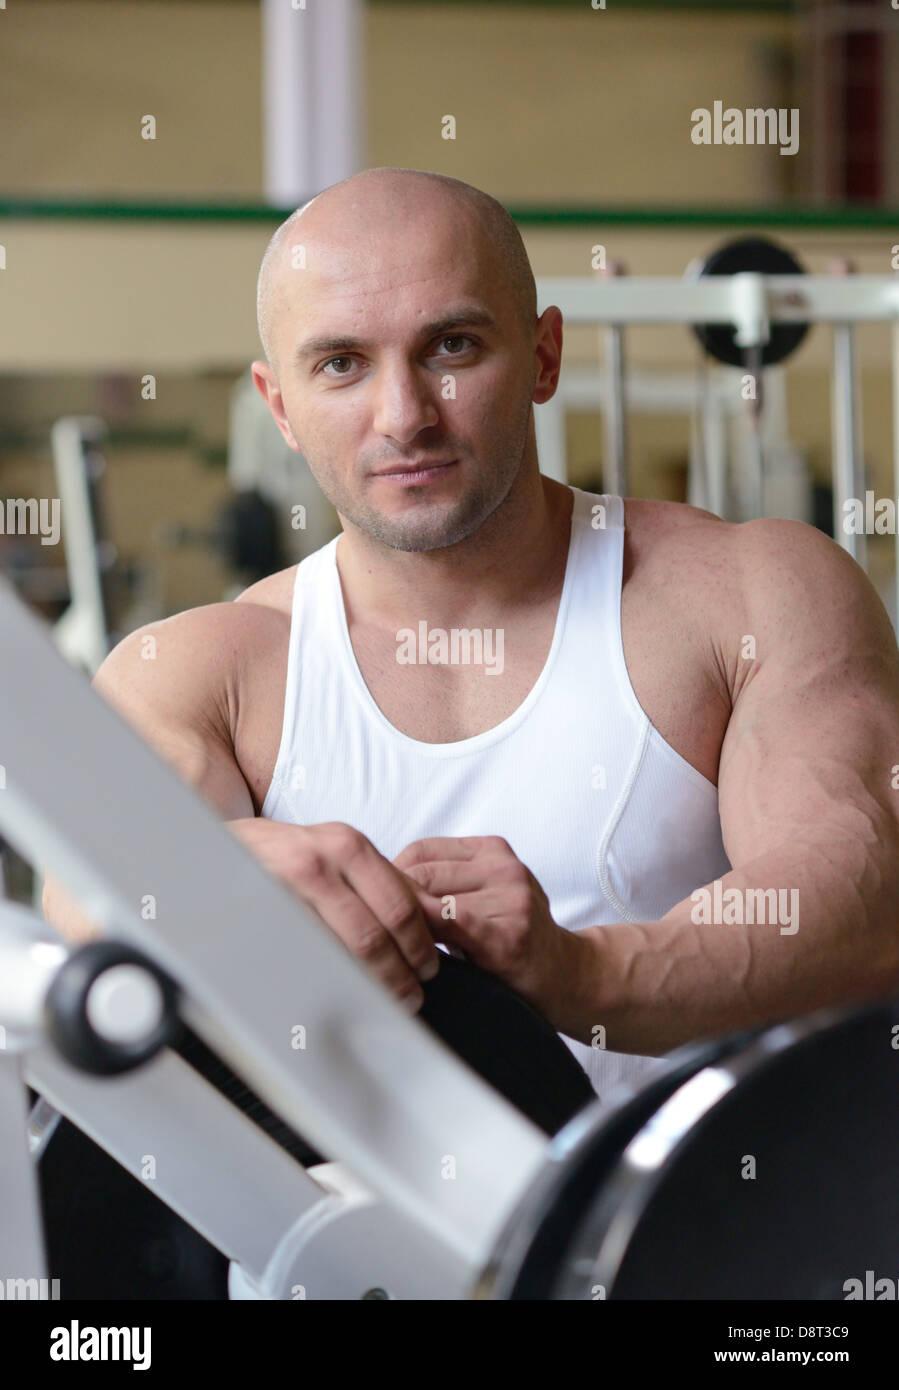 bodybuilder in gym - Stock Image